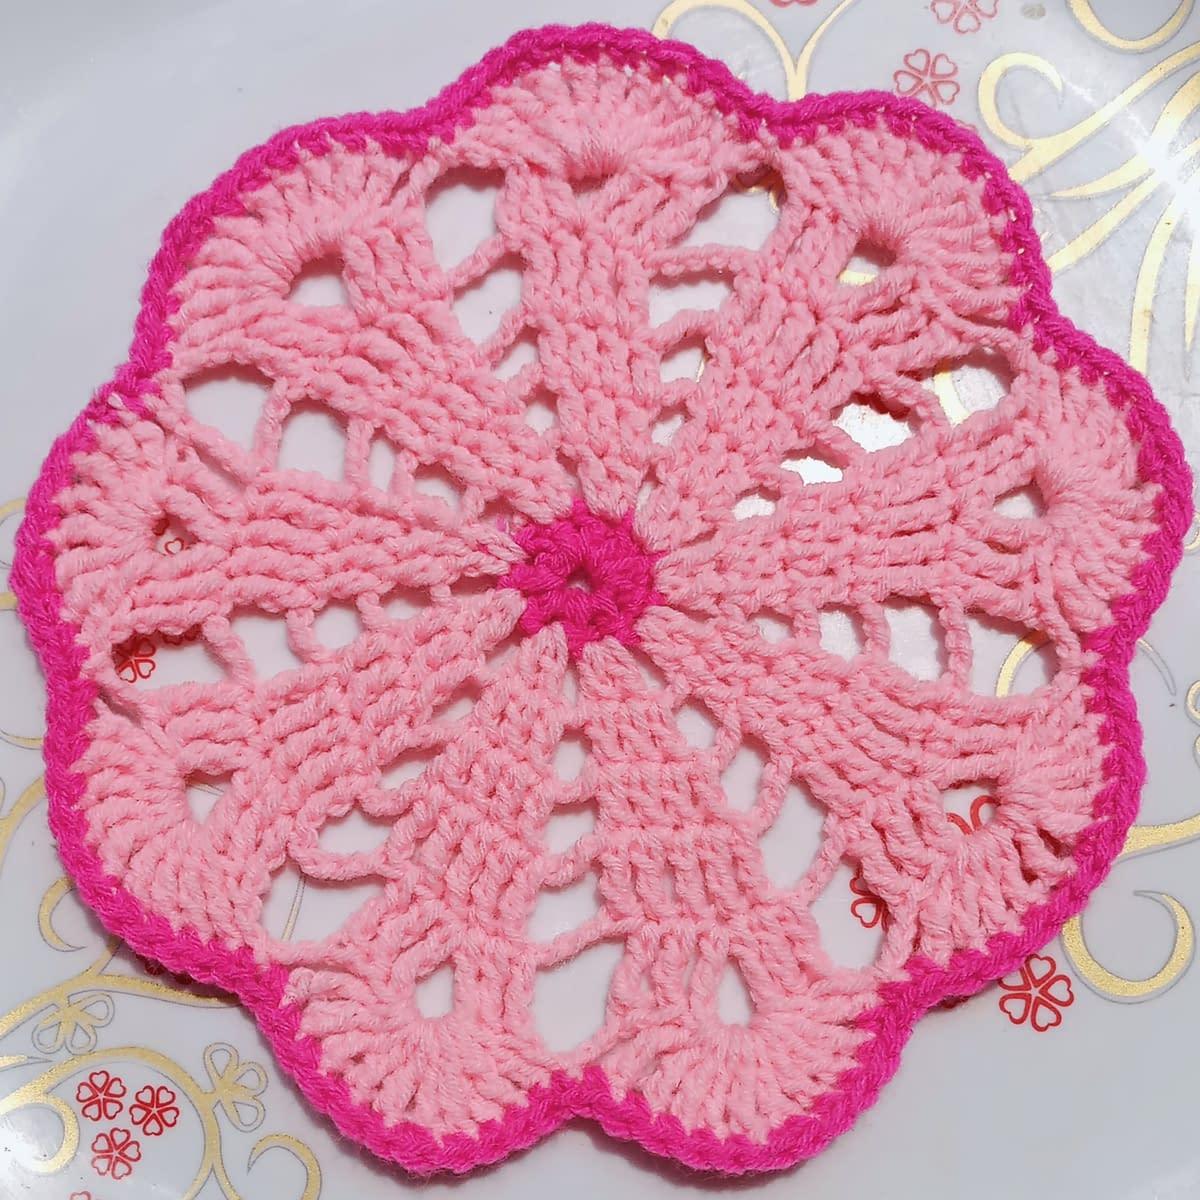 Handmade Crochet coaster 3